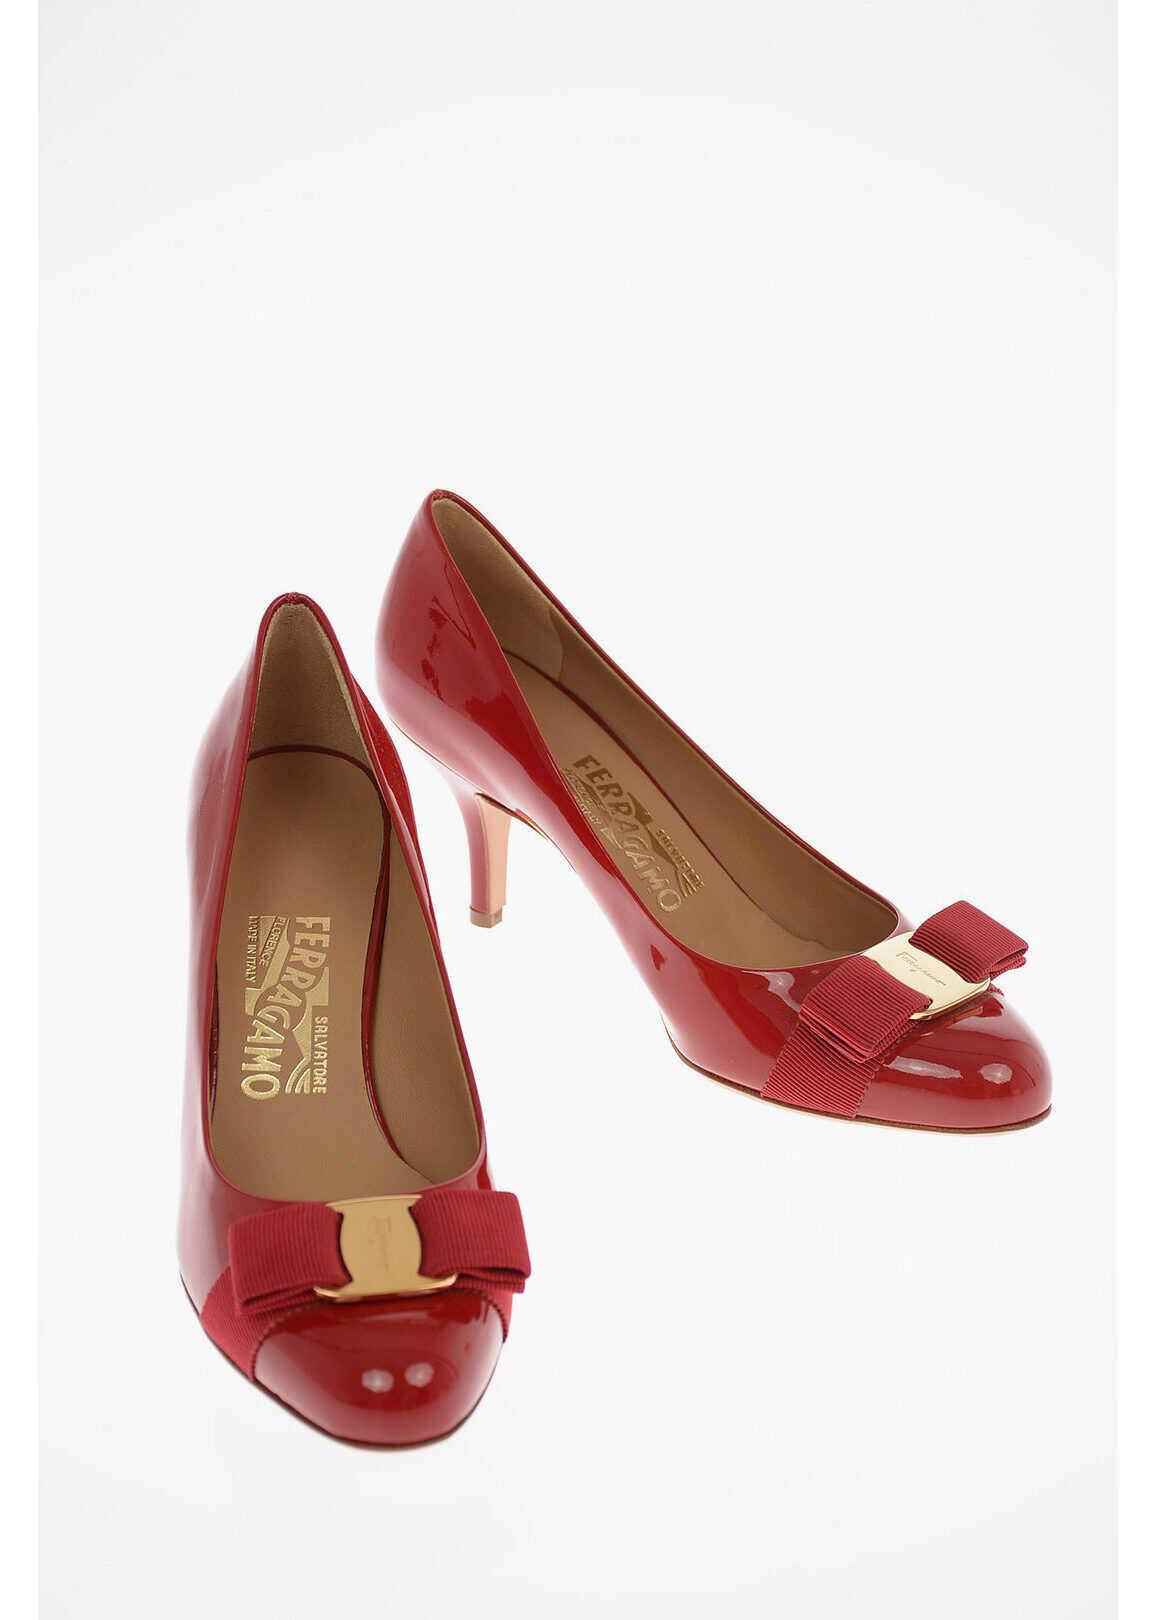 Salvatore Ferragamo Patent Leather CARLA Pumps with Bow Detail 7 cm RED imagine b-mall.ro